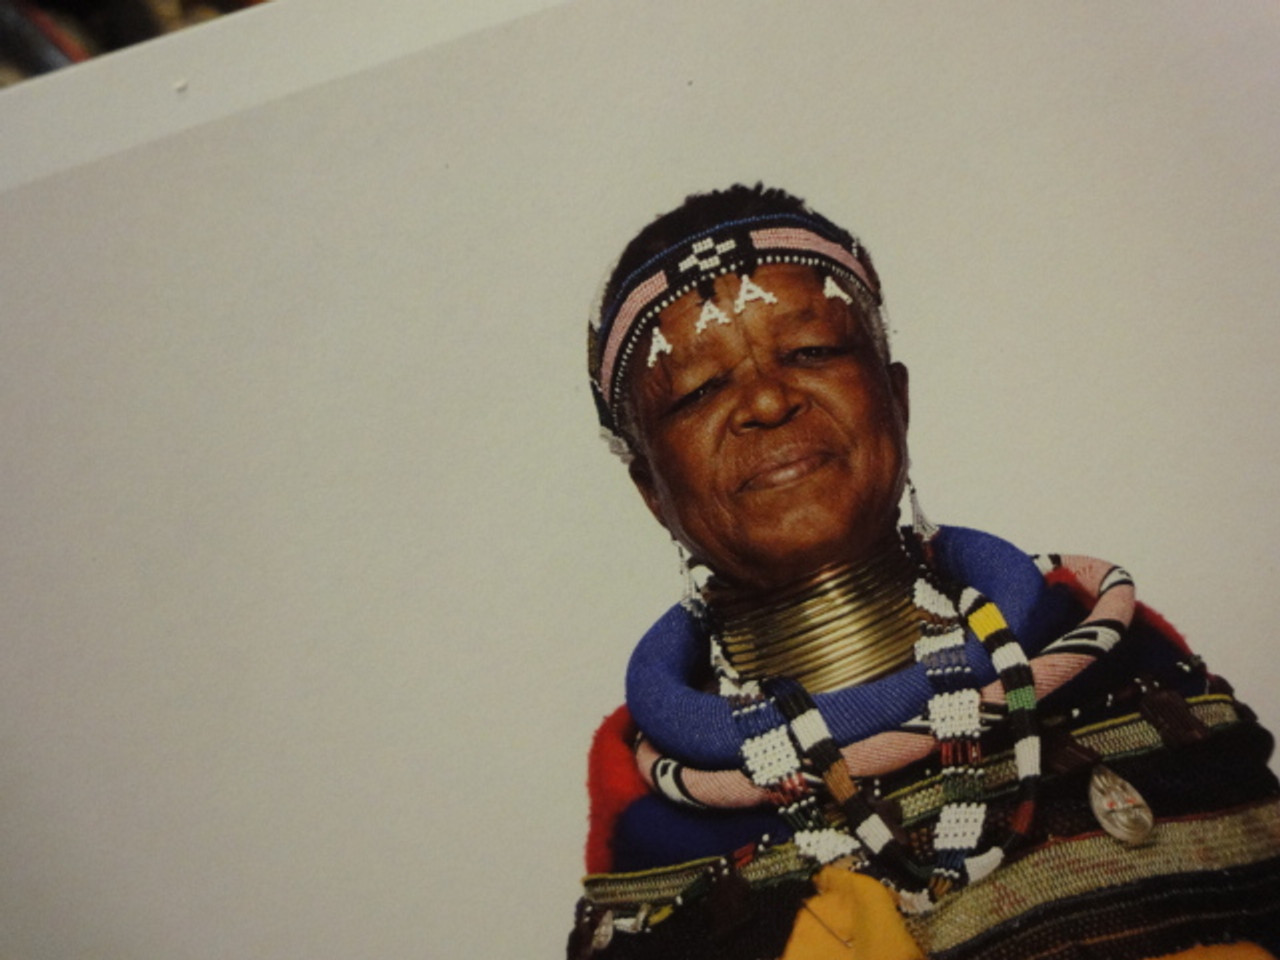 Mahlangu, Esther Color Photo Signed Autograph Original African Garb